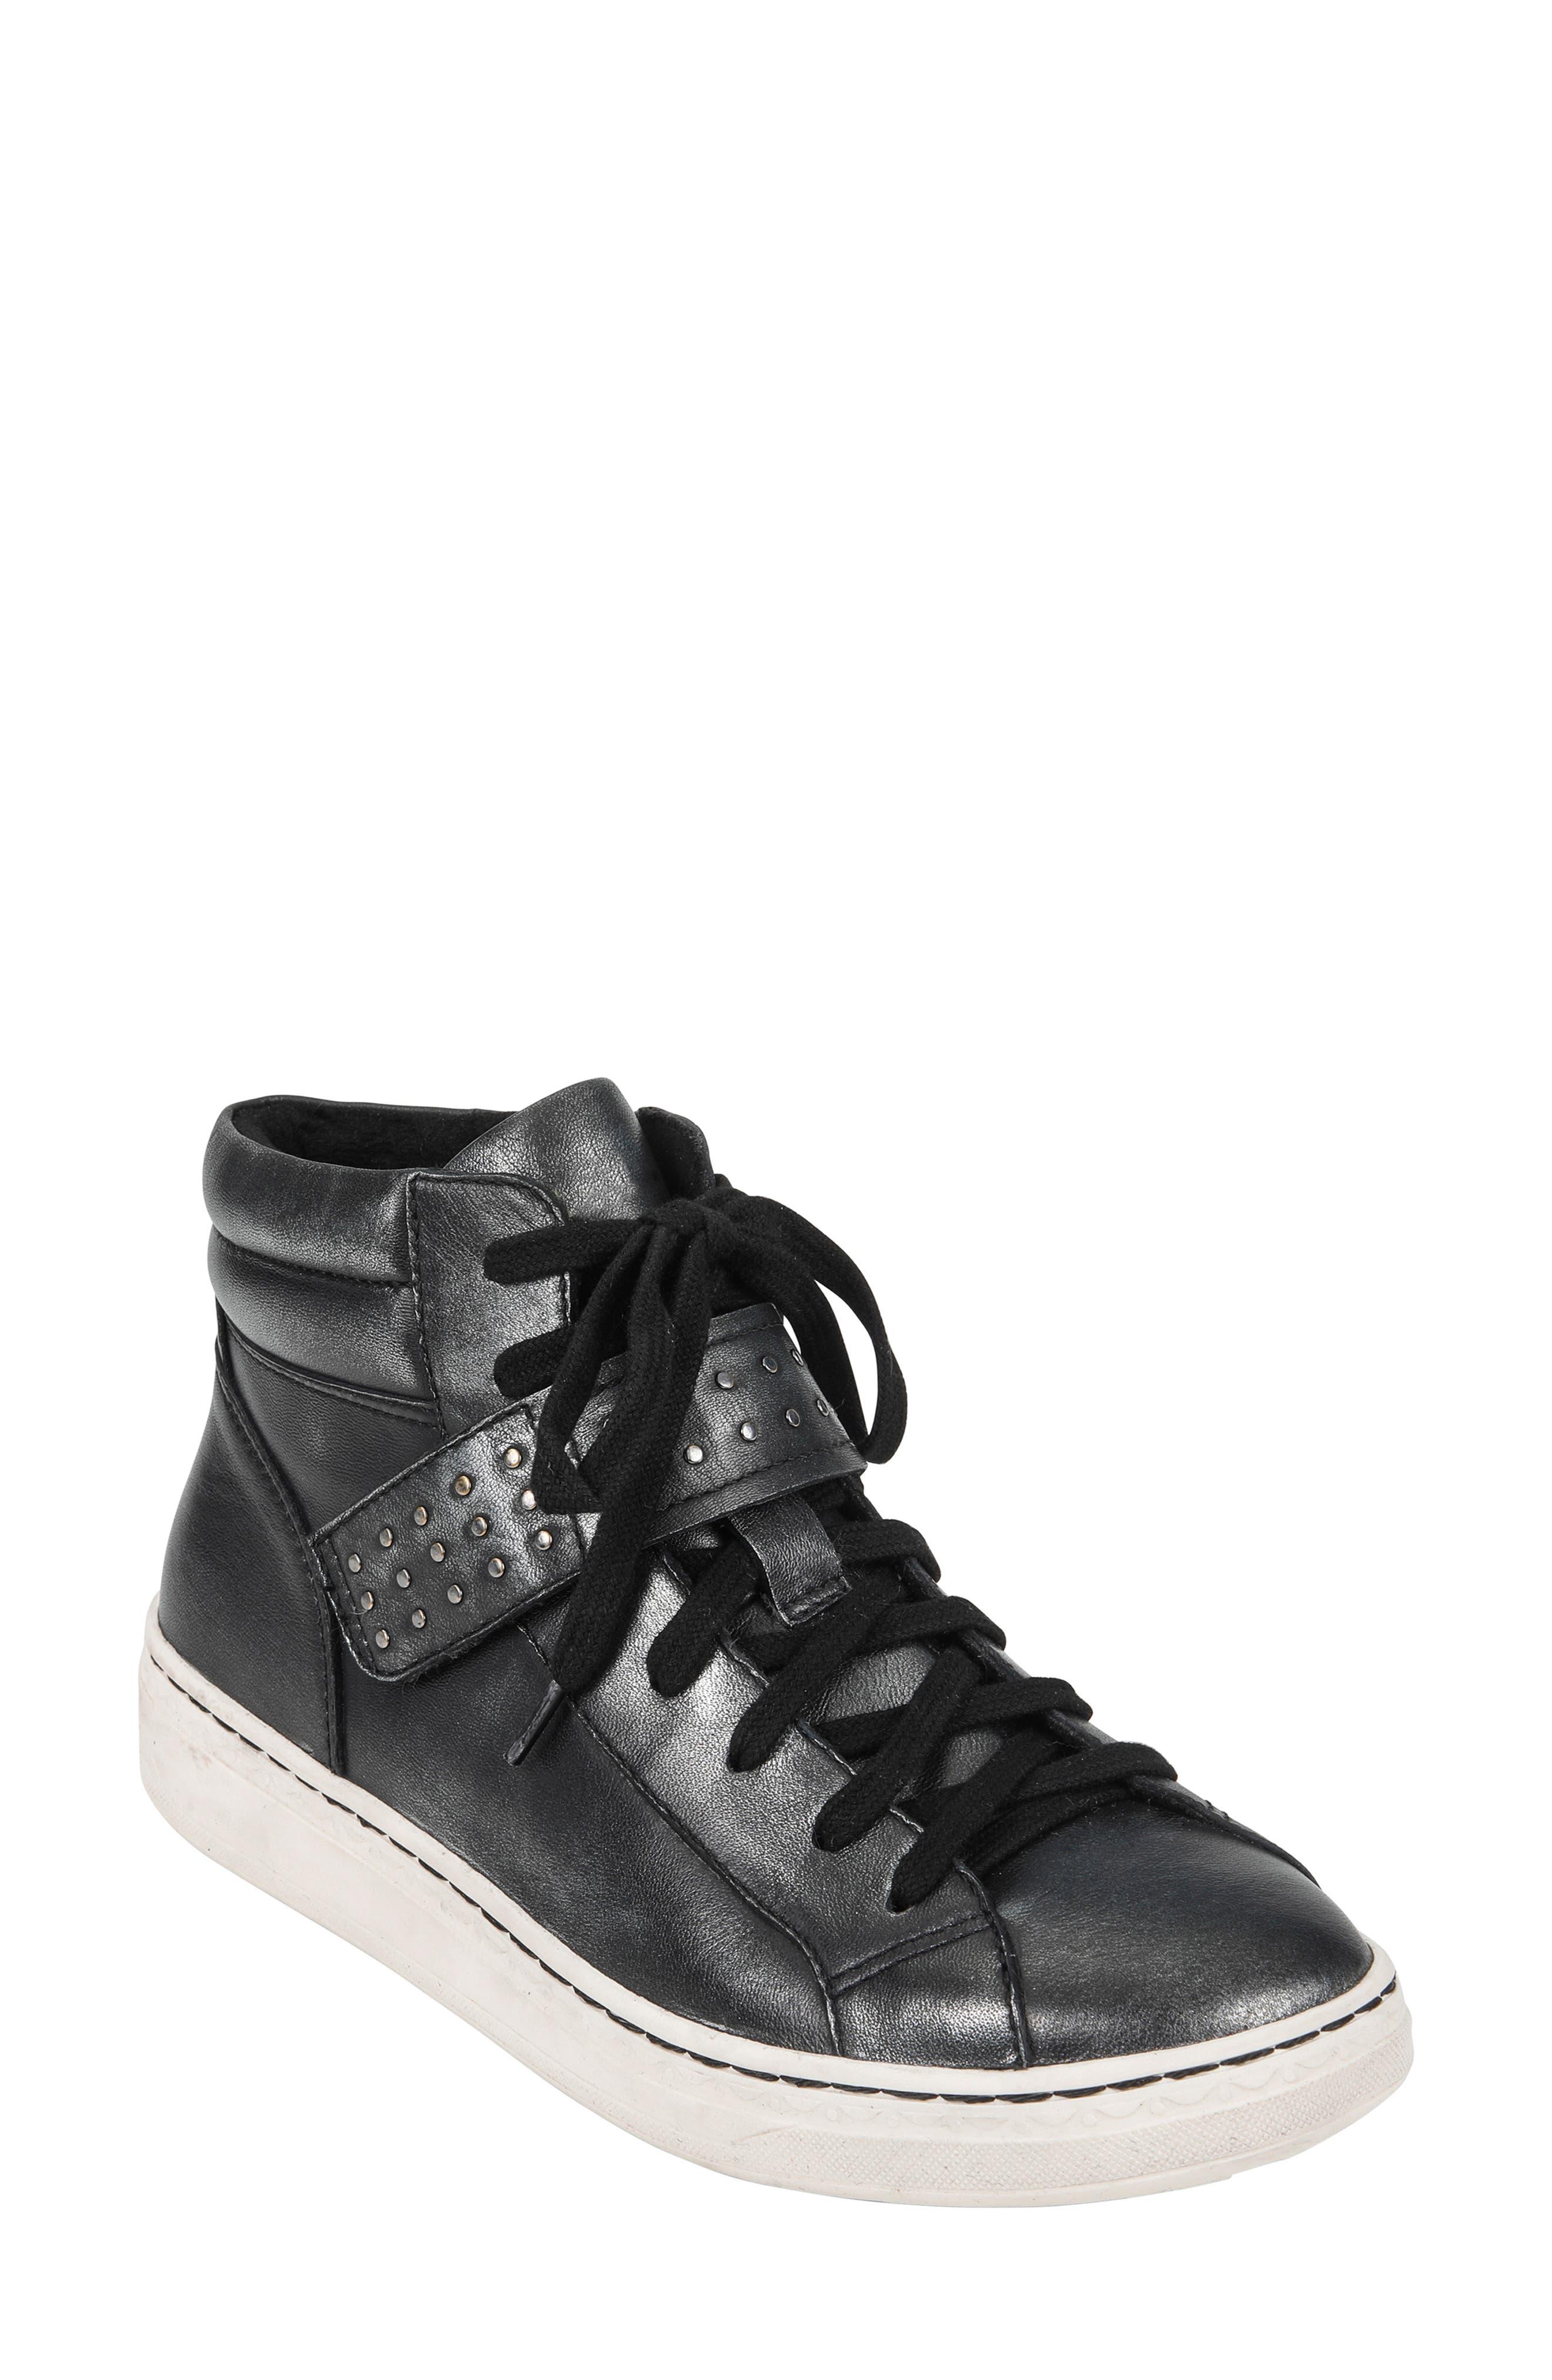 Zeal High Top Sneaker,                         Main,                         color, BLACK METALLIC LEATHER